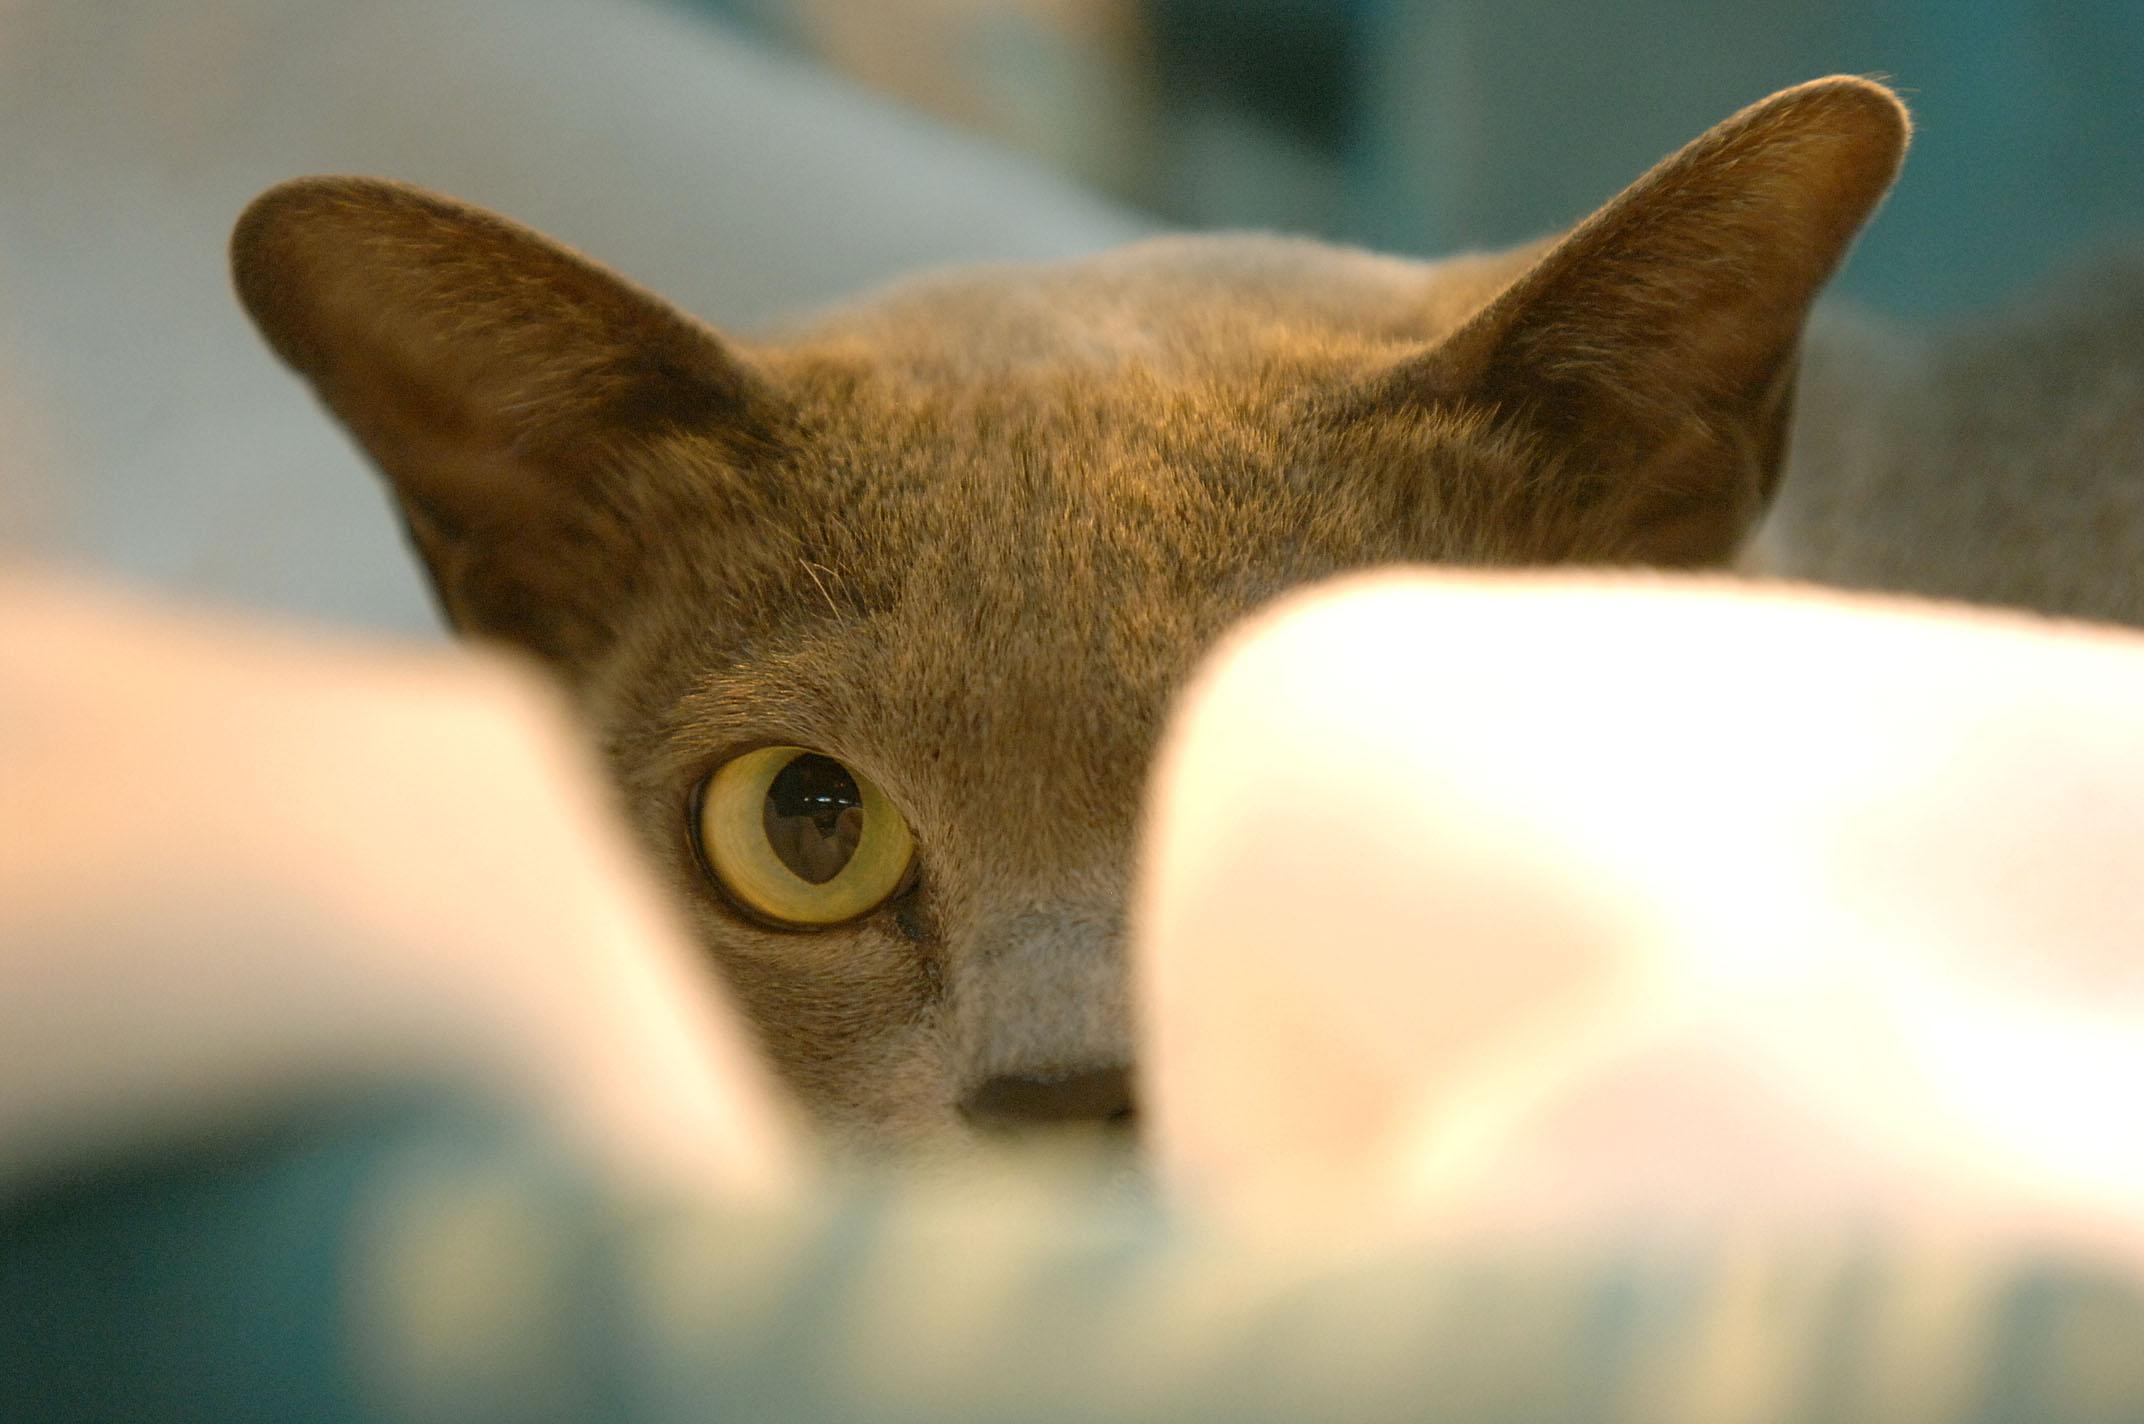 cats6 copy.jpg